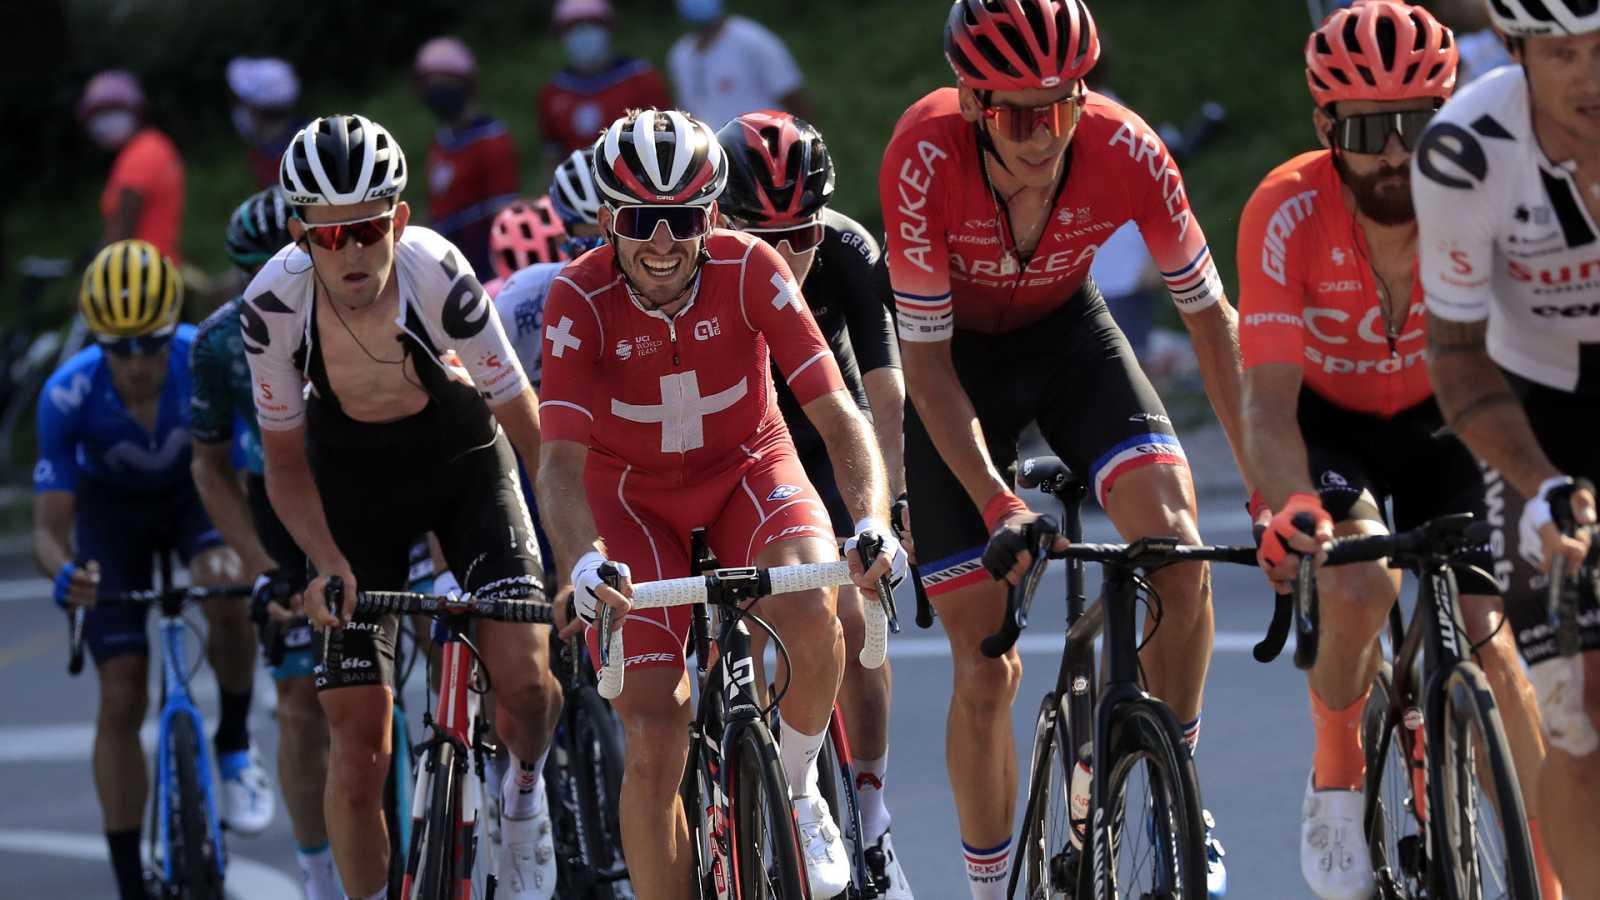 Ciclismo - Tour de Francia - 16ª etapa: La Tour-du-Pin - Villard-de-Lans (2)  - ver ahora